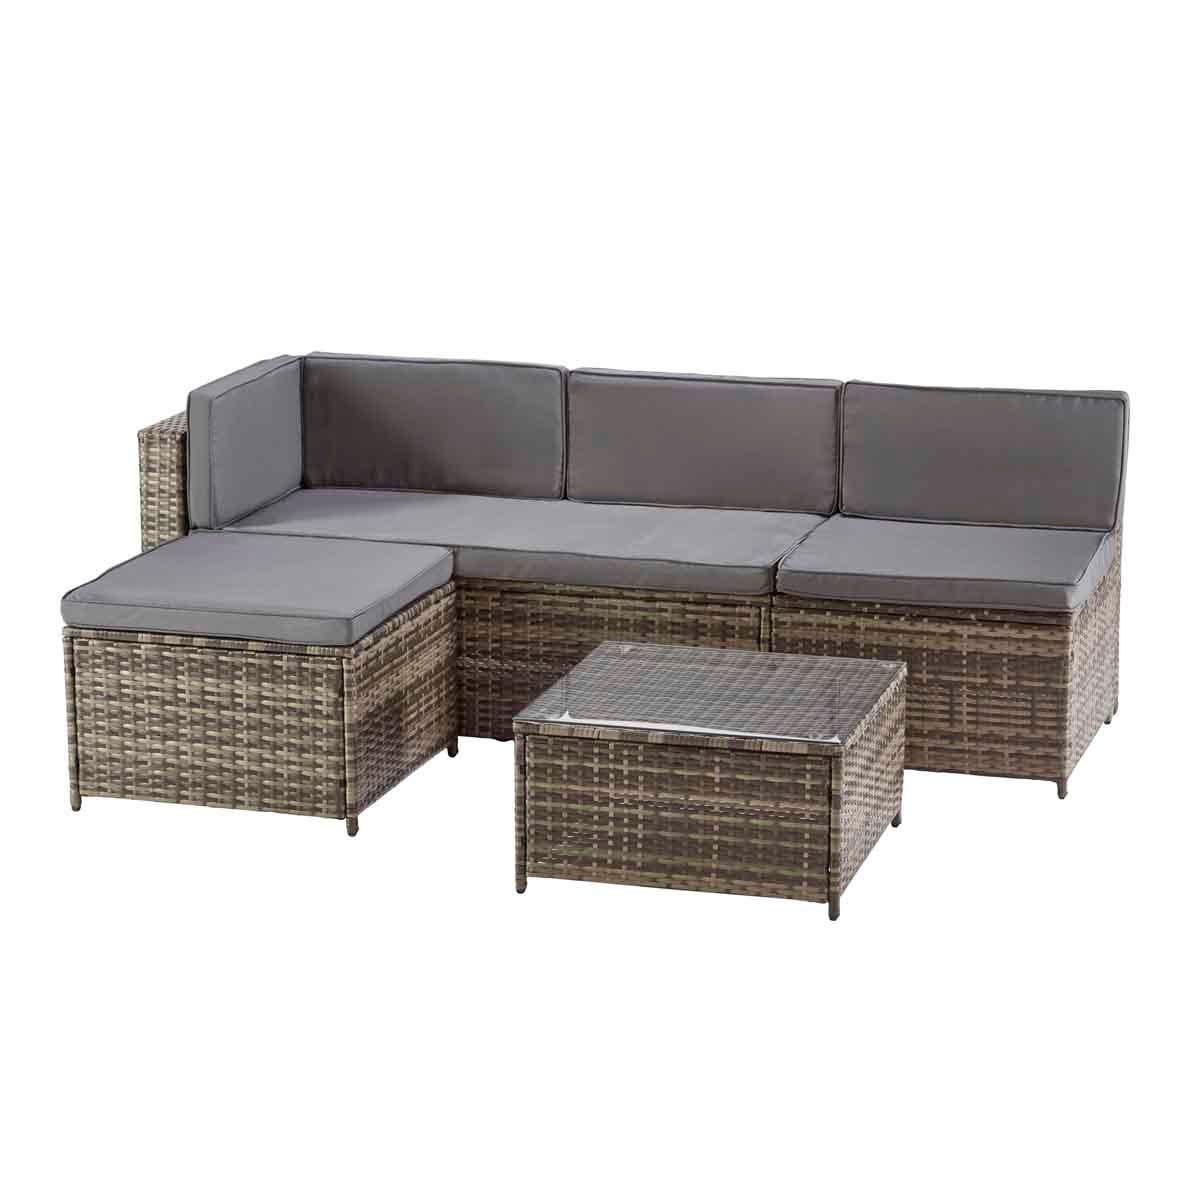 Garden Gear Milan Rattan Lounge Sofa Set - Dark Grey